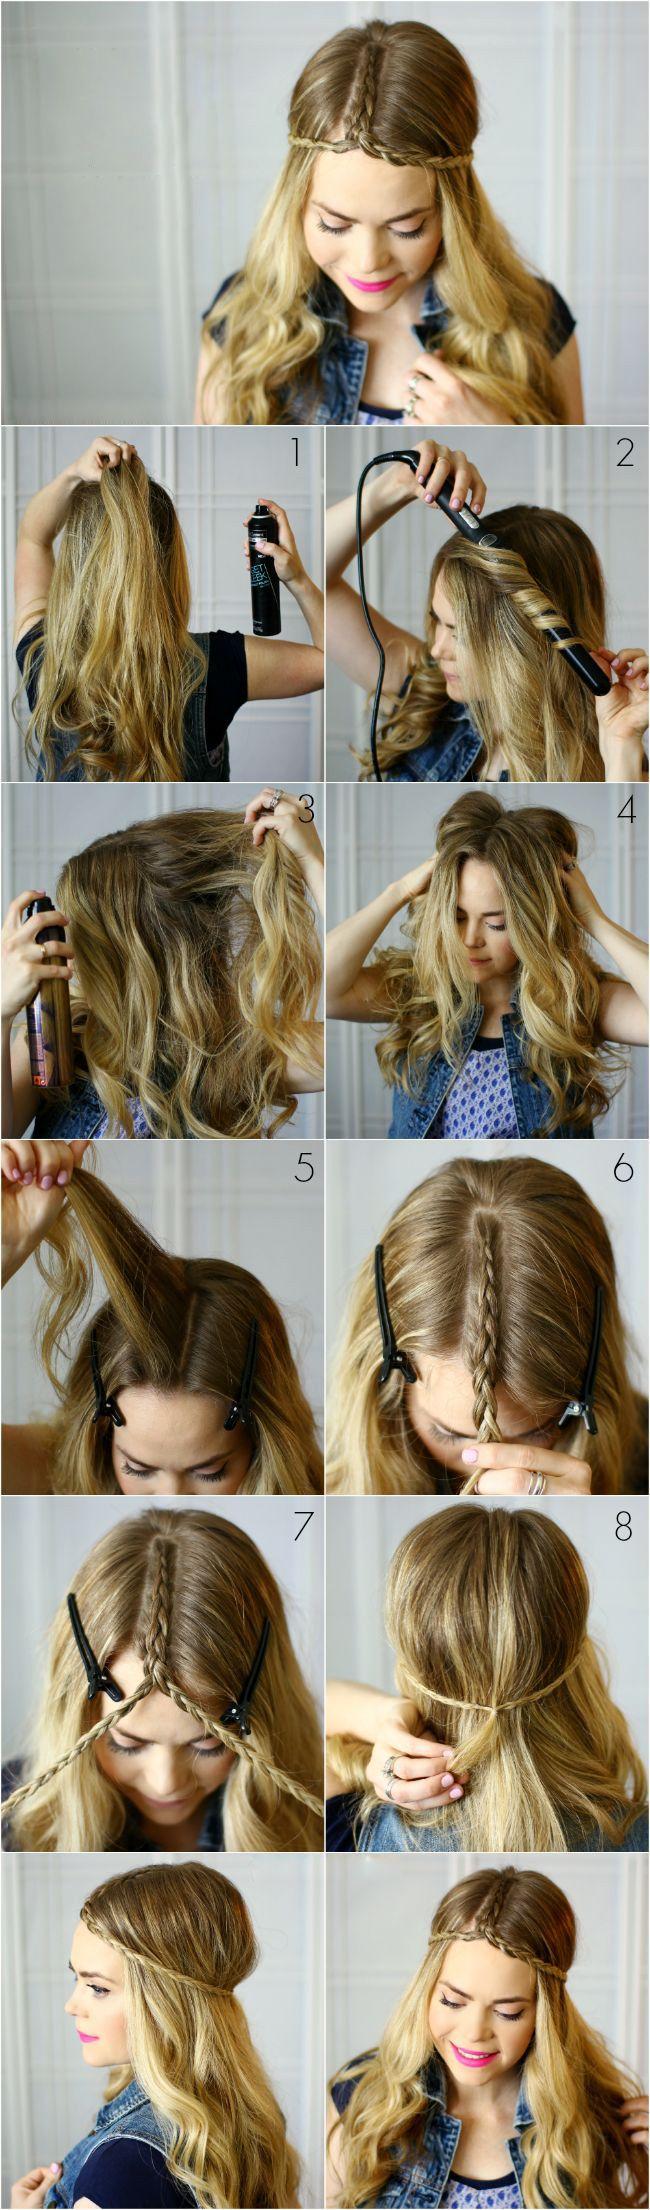 Pin by tonita cuenca on hair pinterest plait hairstyles hair